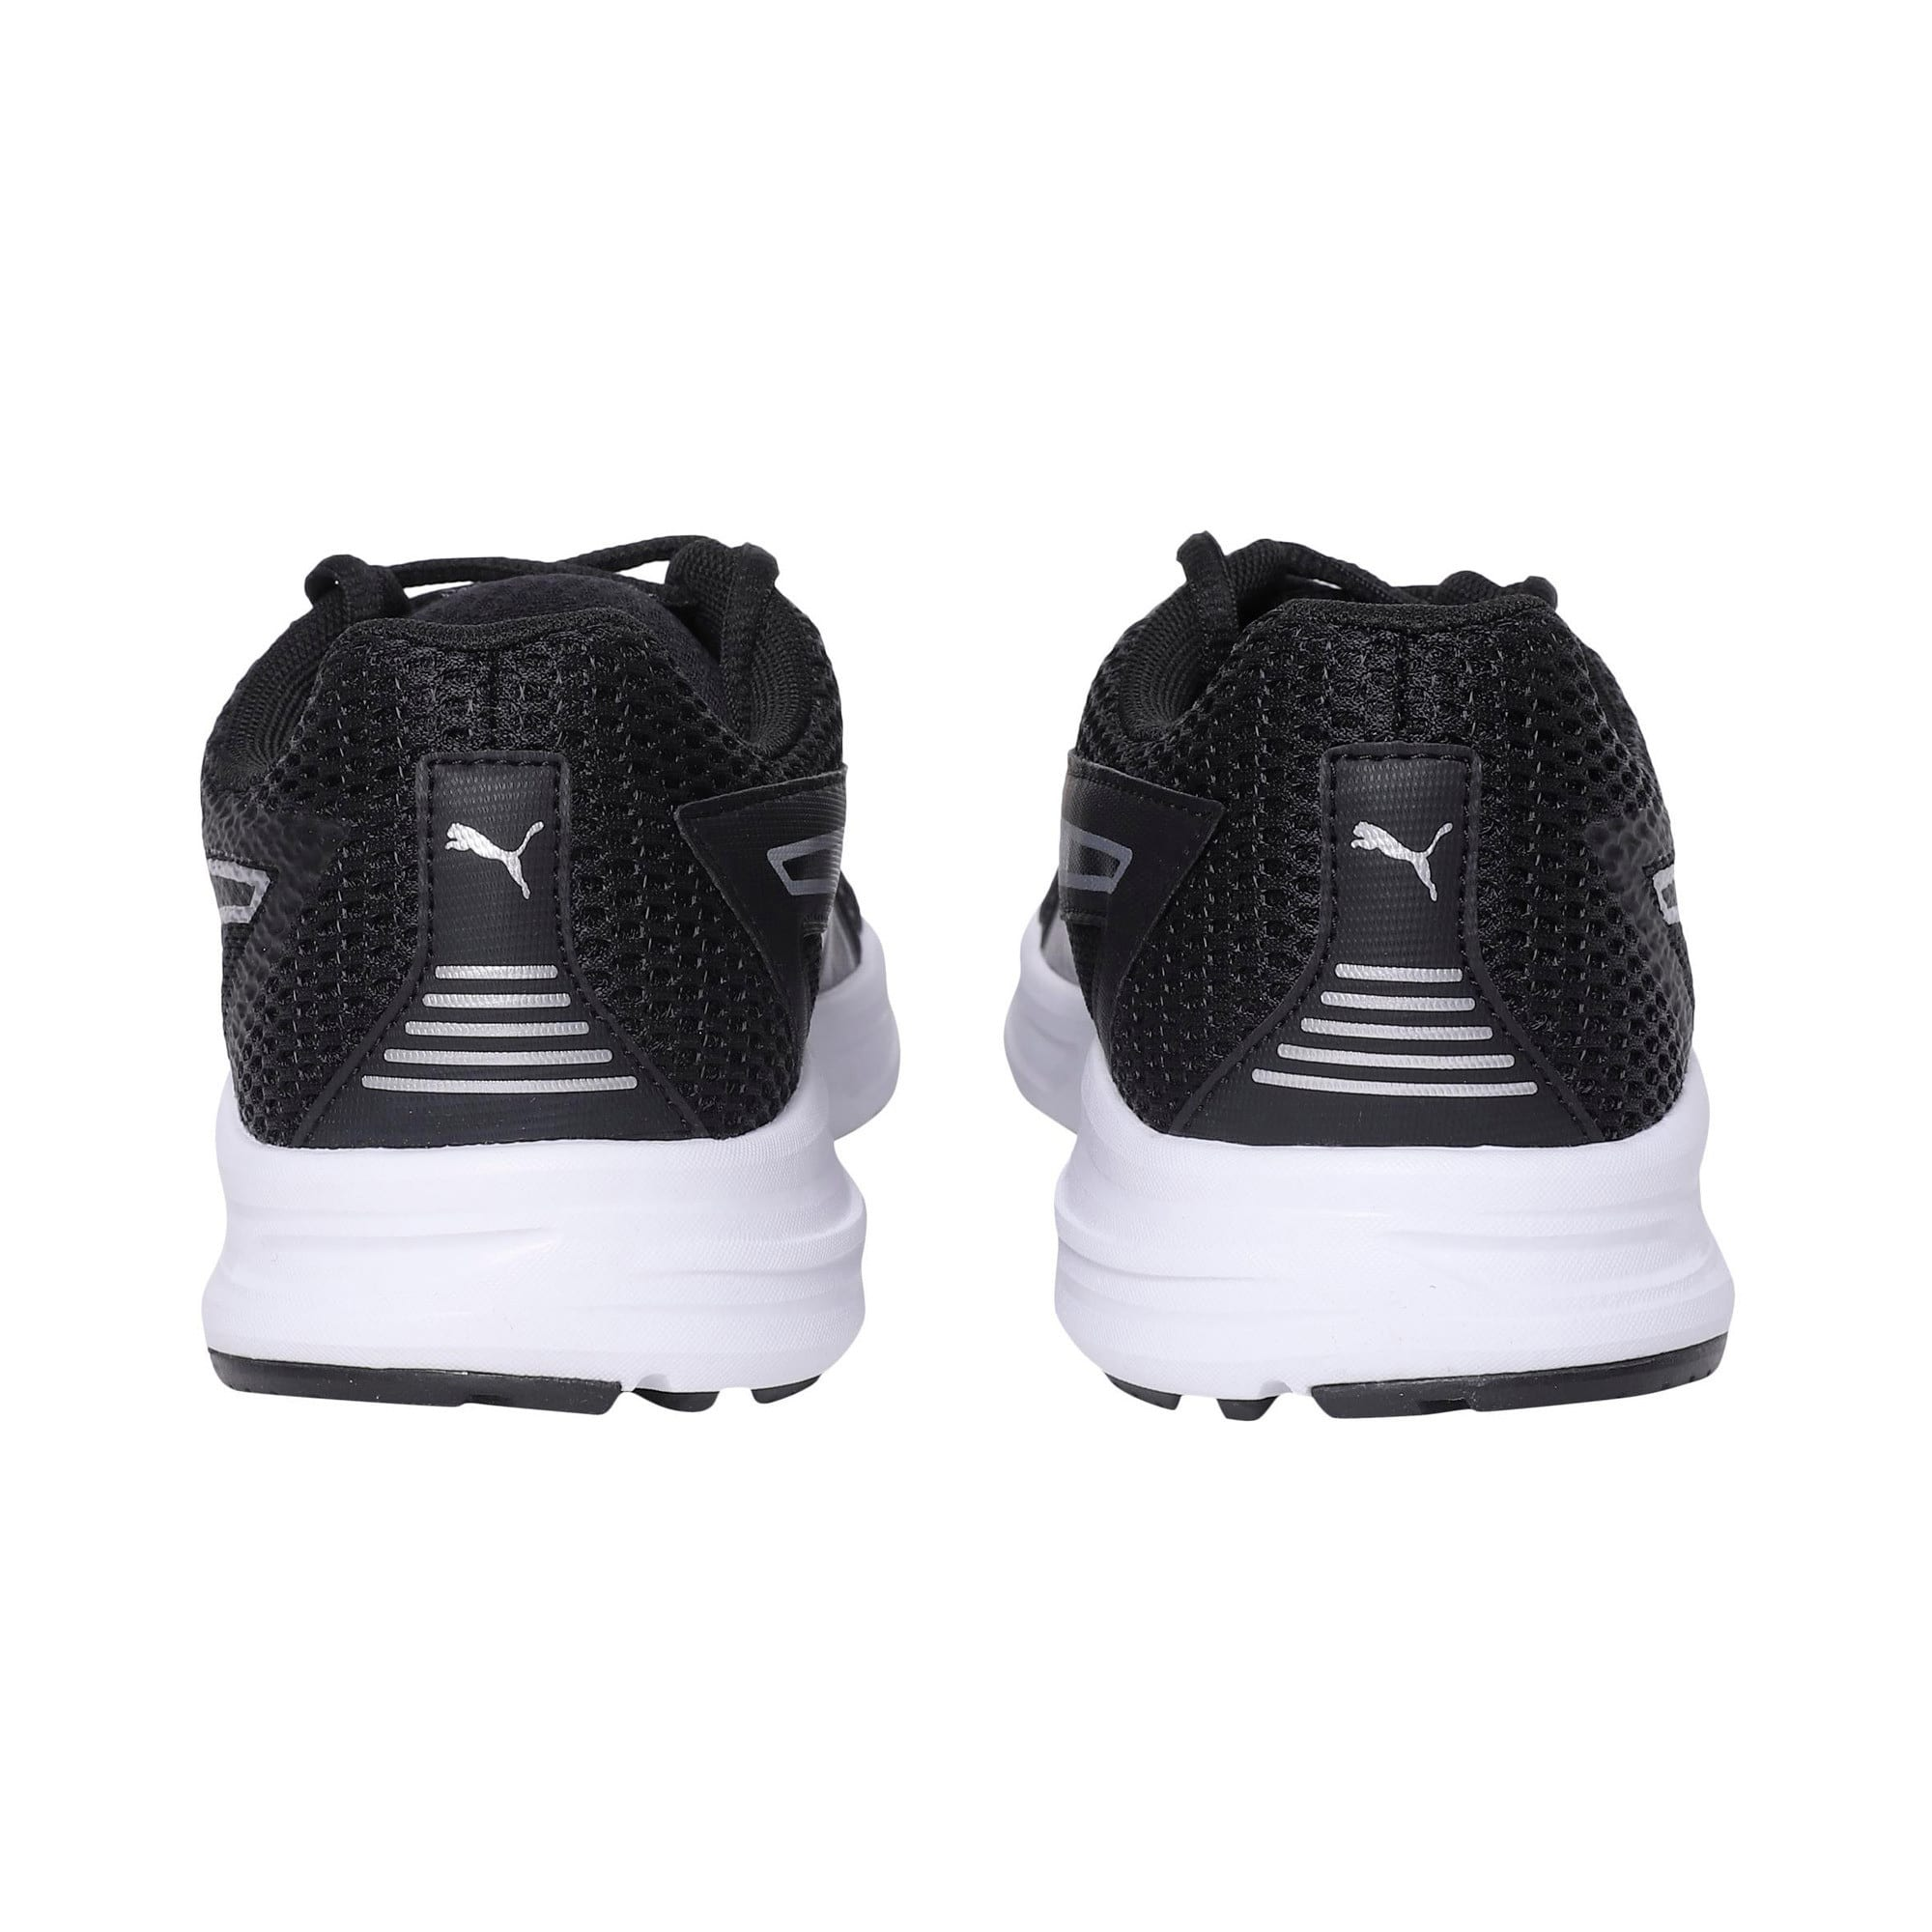 Thumbnail 3 of Essential Runner Men's Running Shoes, Puma Black-Puma Silver, medium-IND